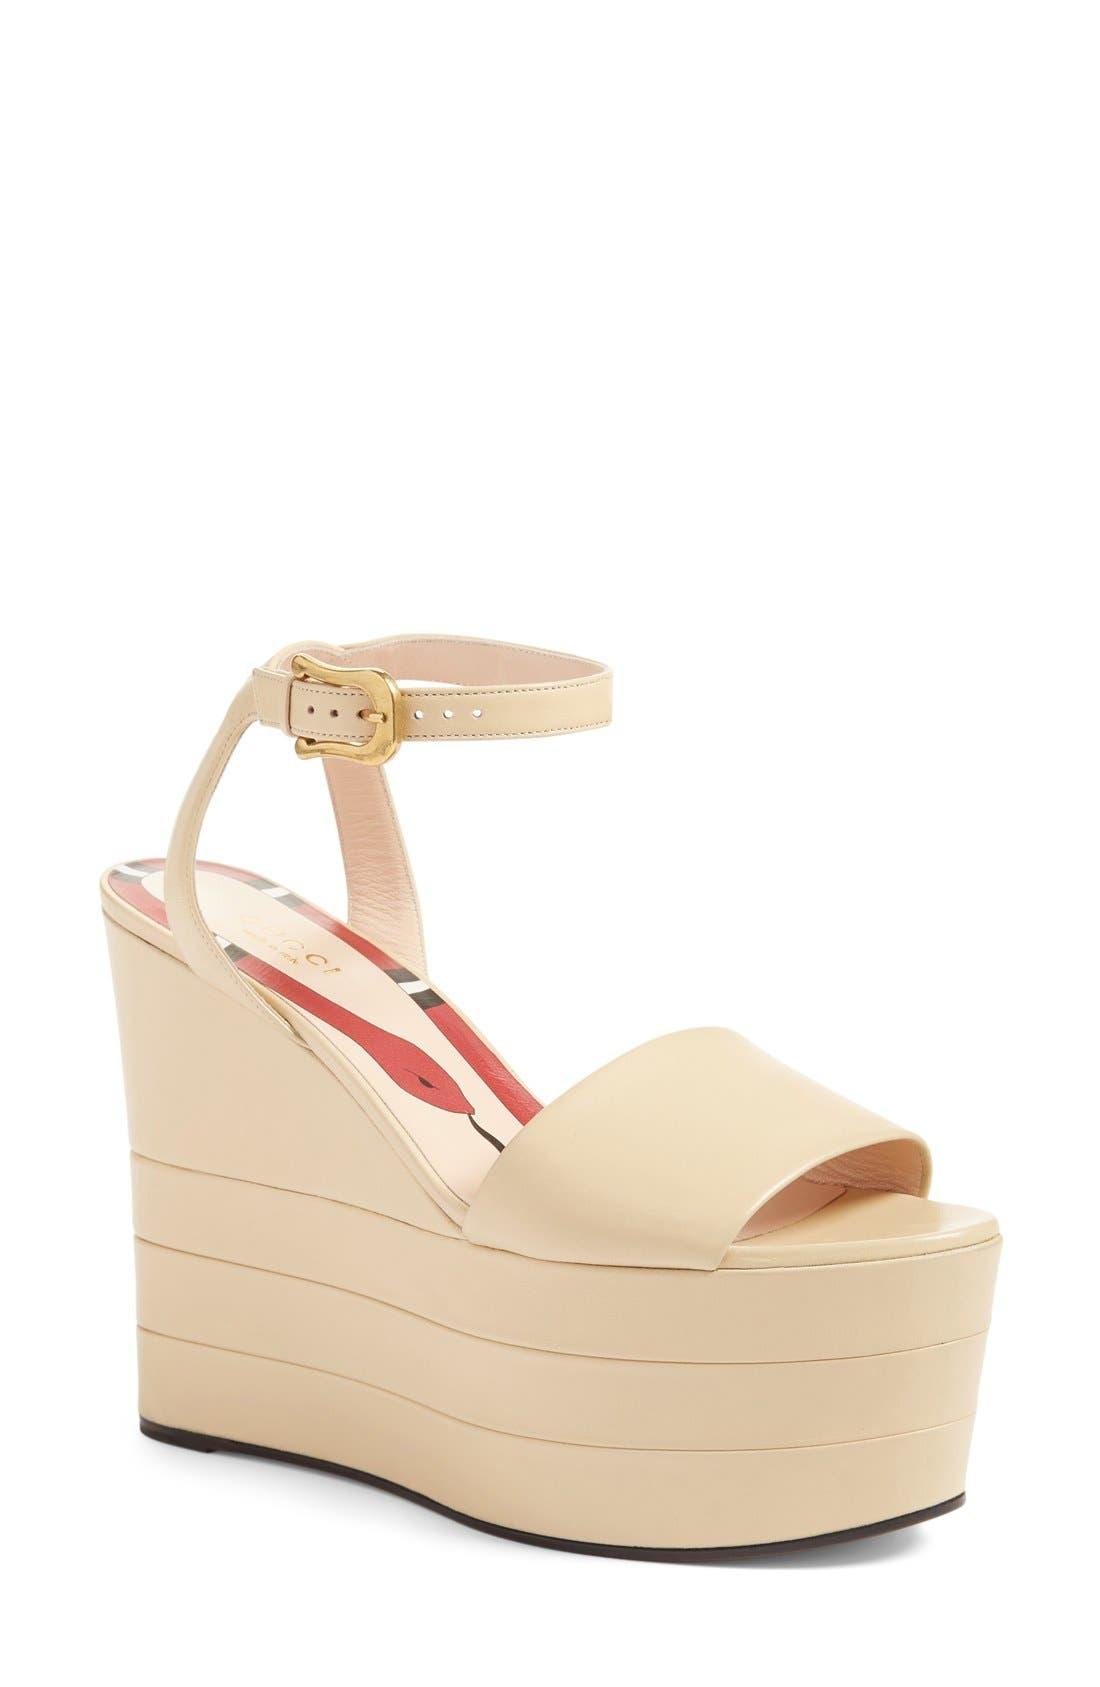 Alternate Image 1 Selected - Gucci 'Sally' Platform Sandal (Women)